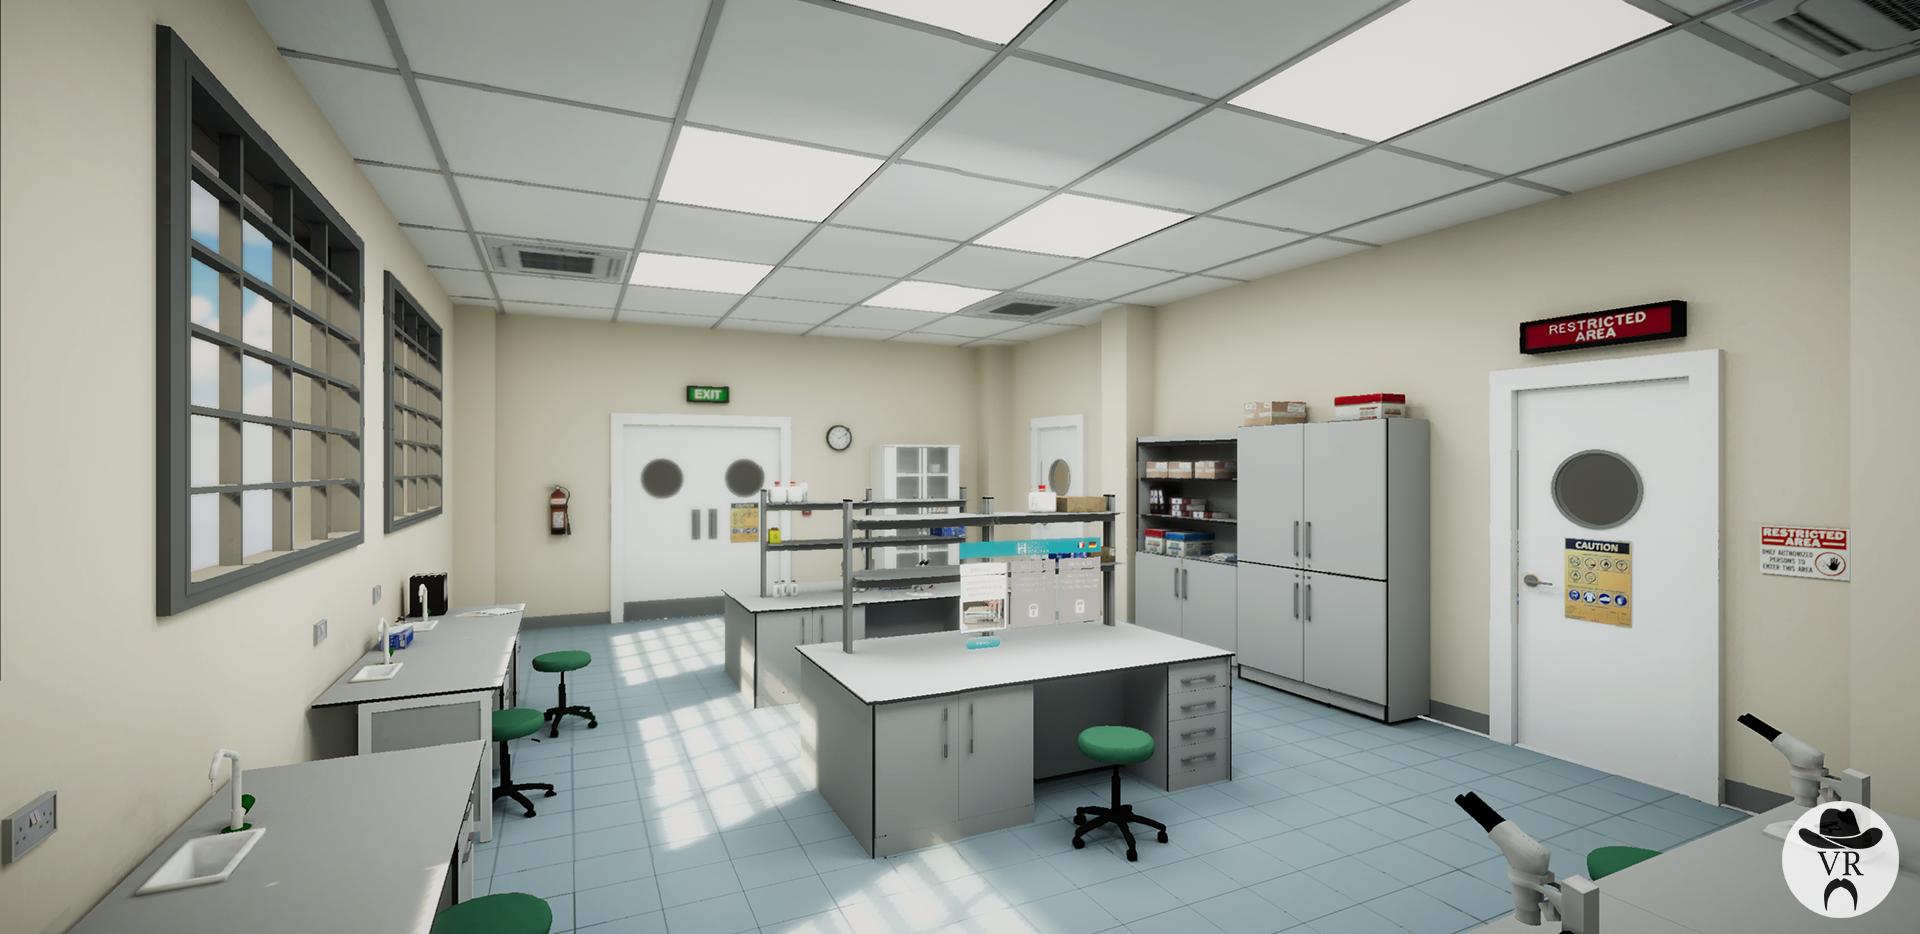 Hôpitaux Robert Schuman formation réalité virtuelle Virtual Rangers